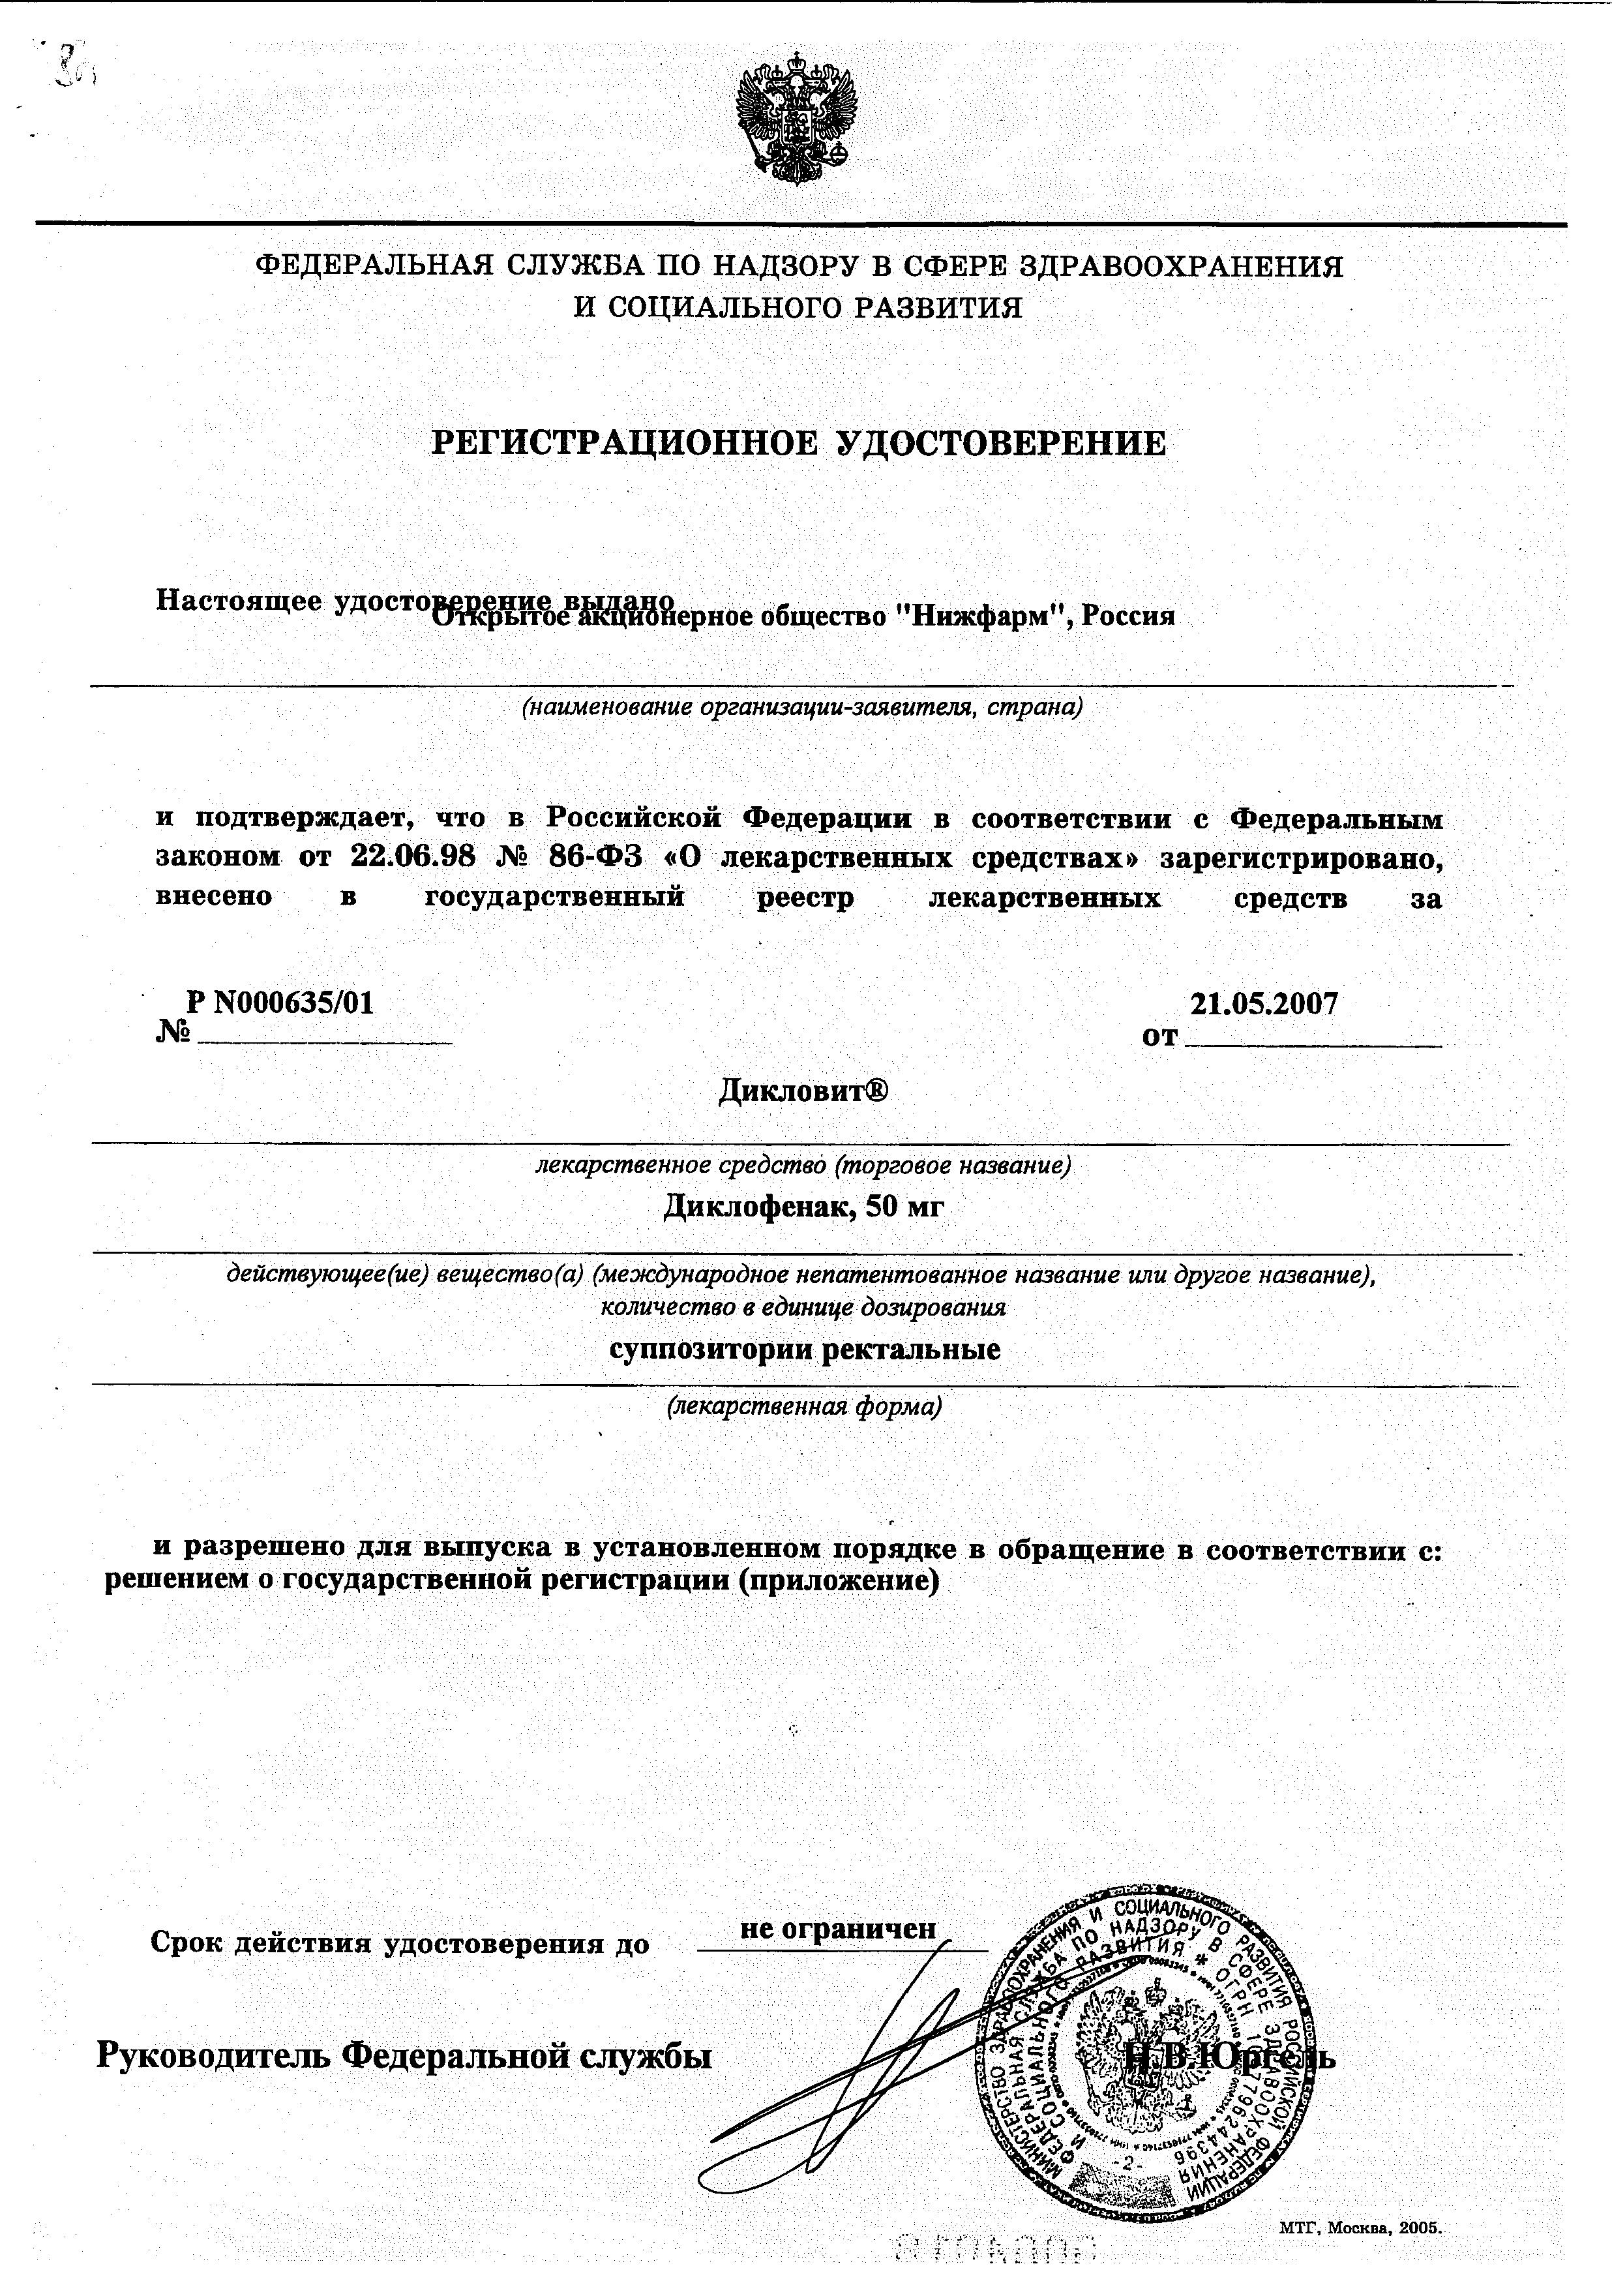 Дикловит сертификат